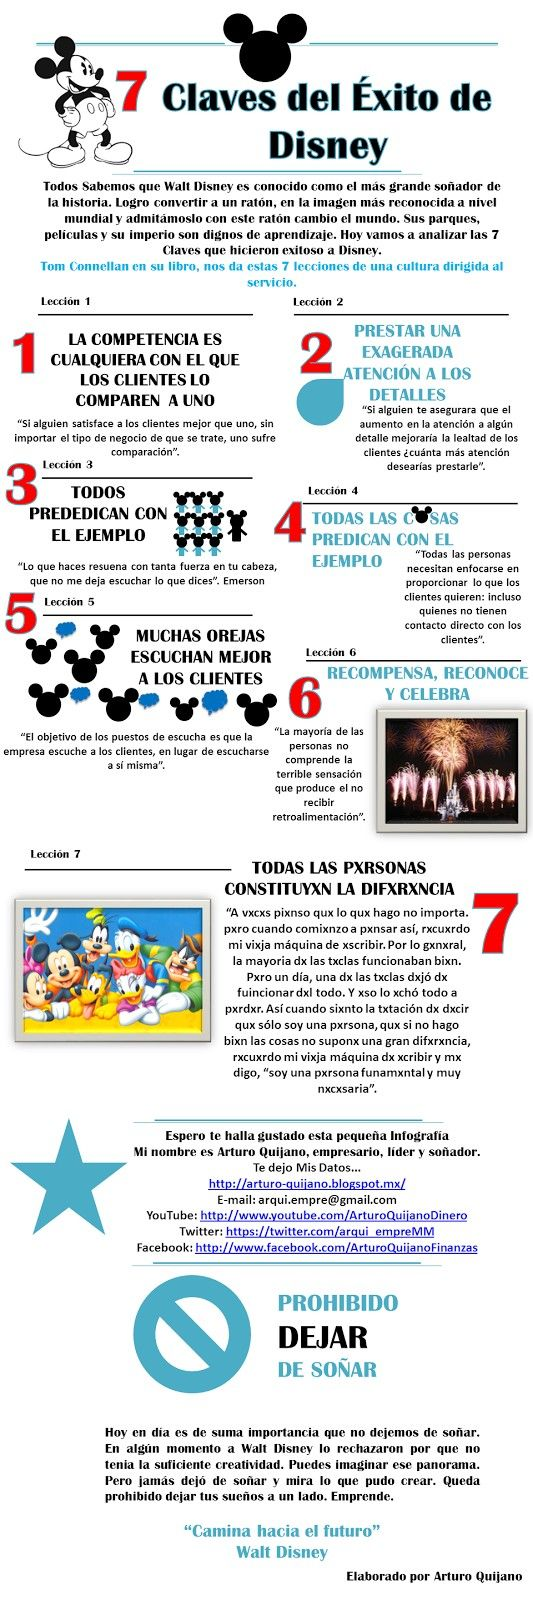 7 claves del éxito de Disney #infografia #infographic #marketing